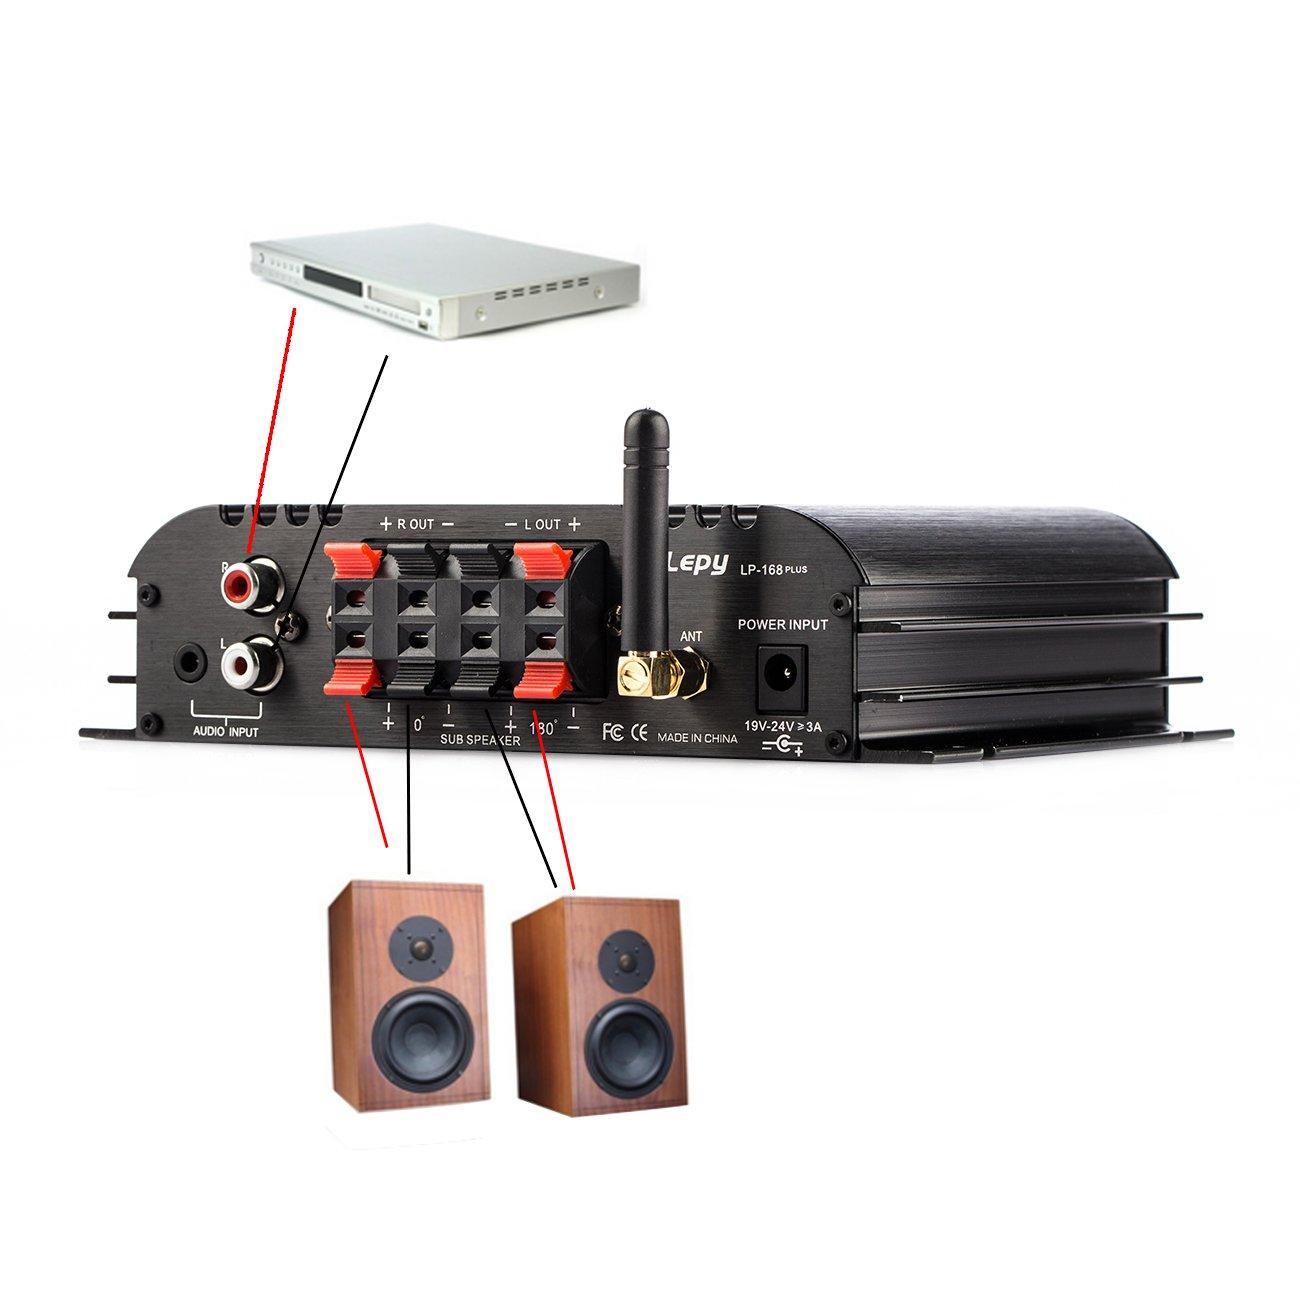 LEPY lp-168/Plus 45/Wx2/ 68/W Amplificador est/éreo USB Bluetooth 2.1/ch Hi-Fi Audio Digital con Entrada de Subwoofer